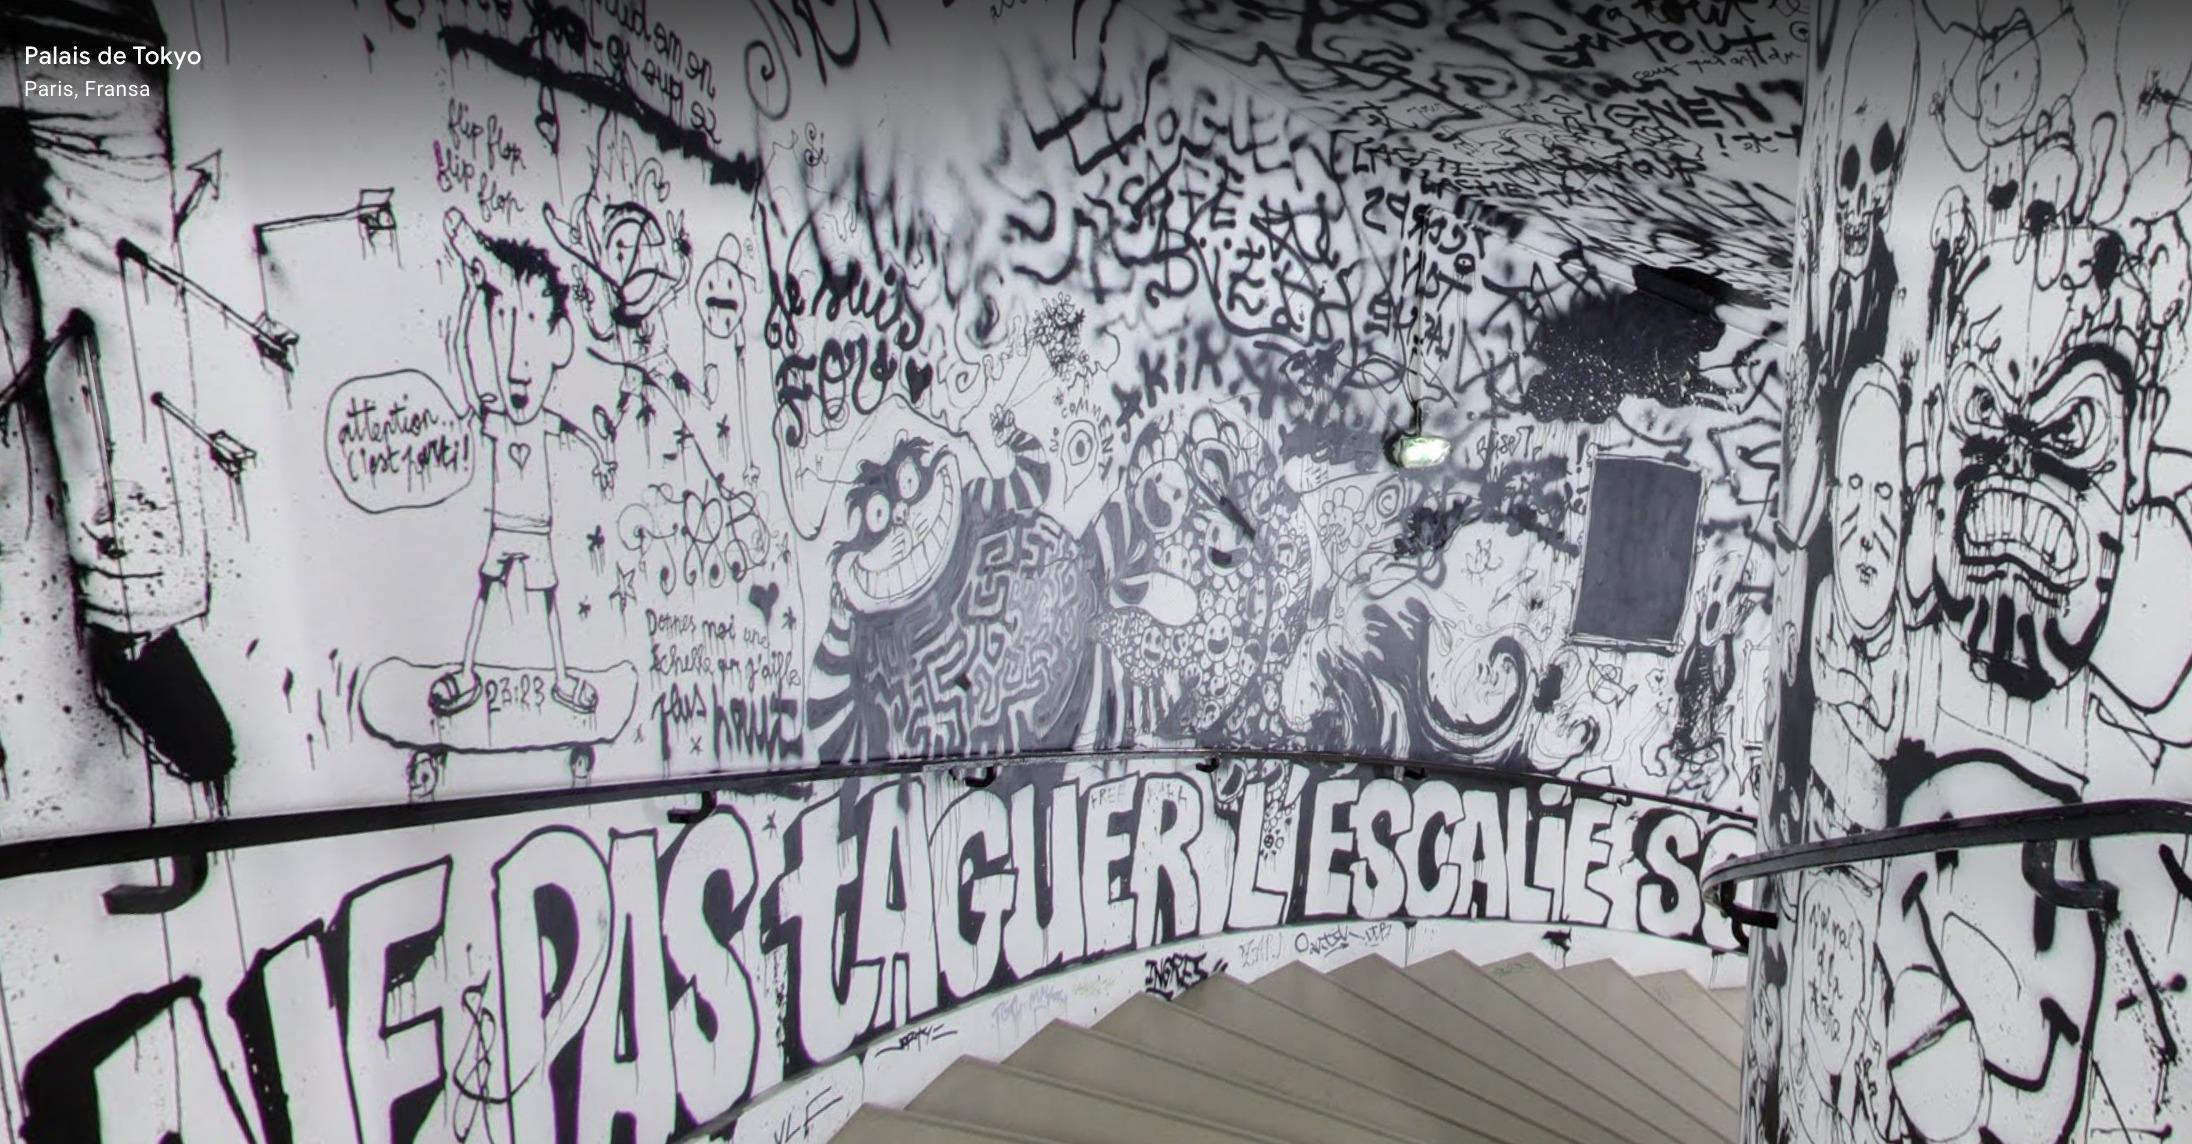 Palais de Tokyo, Lasco Project, Google Arts & Culture ekran görüntüsü